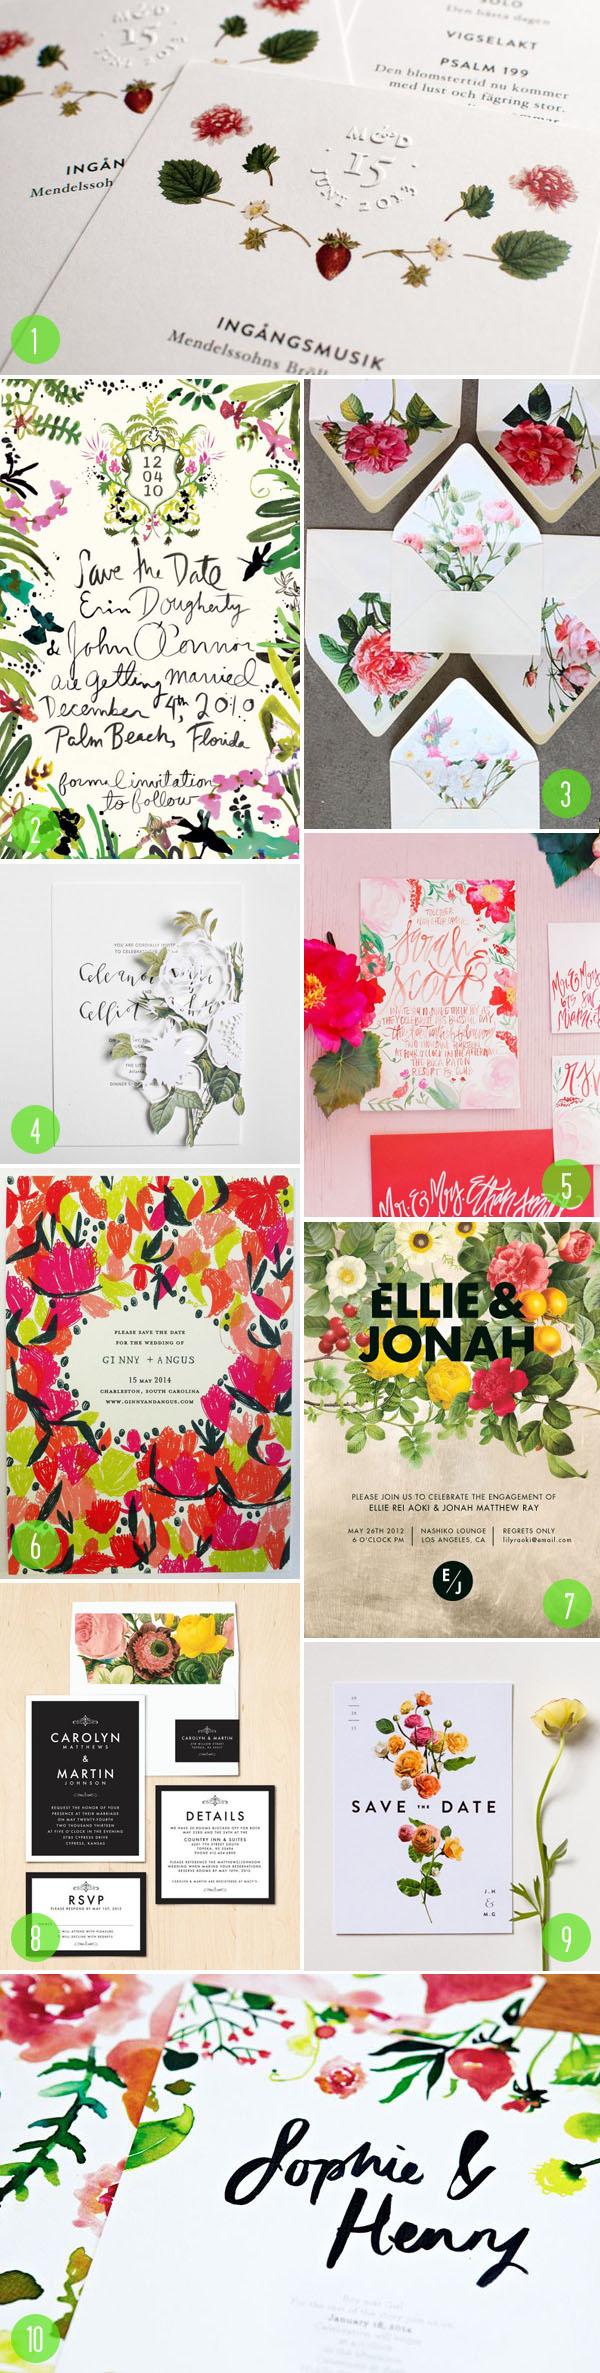 top 10: floral wedding invitations